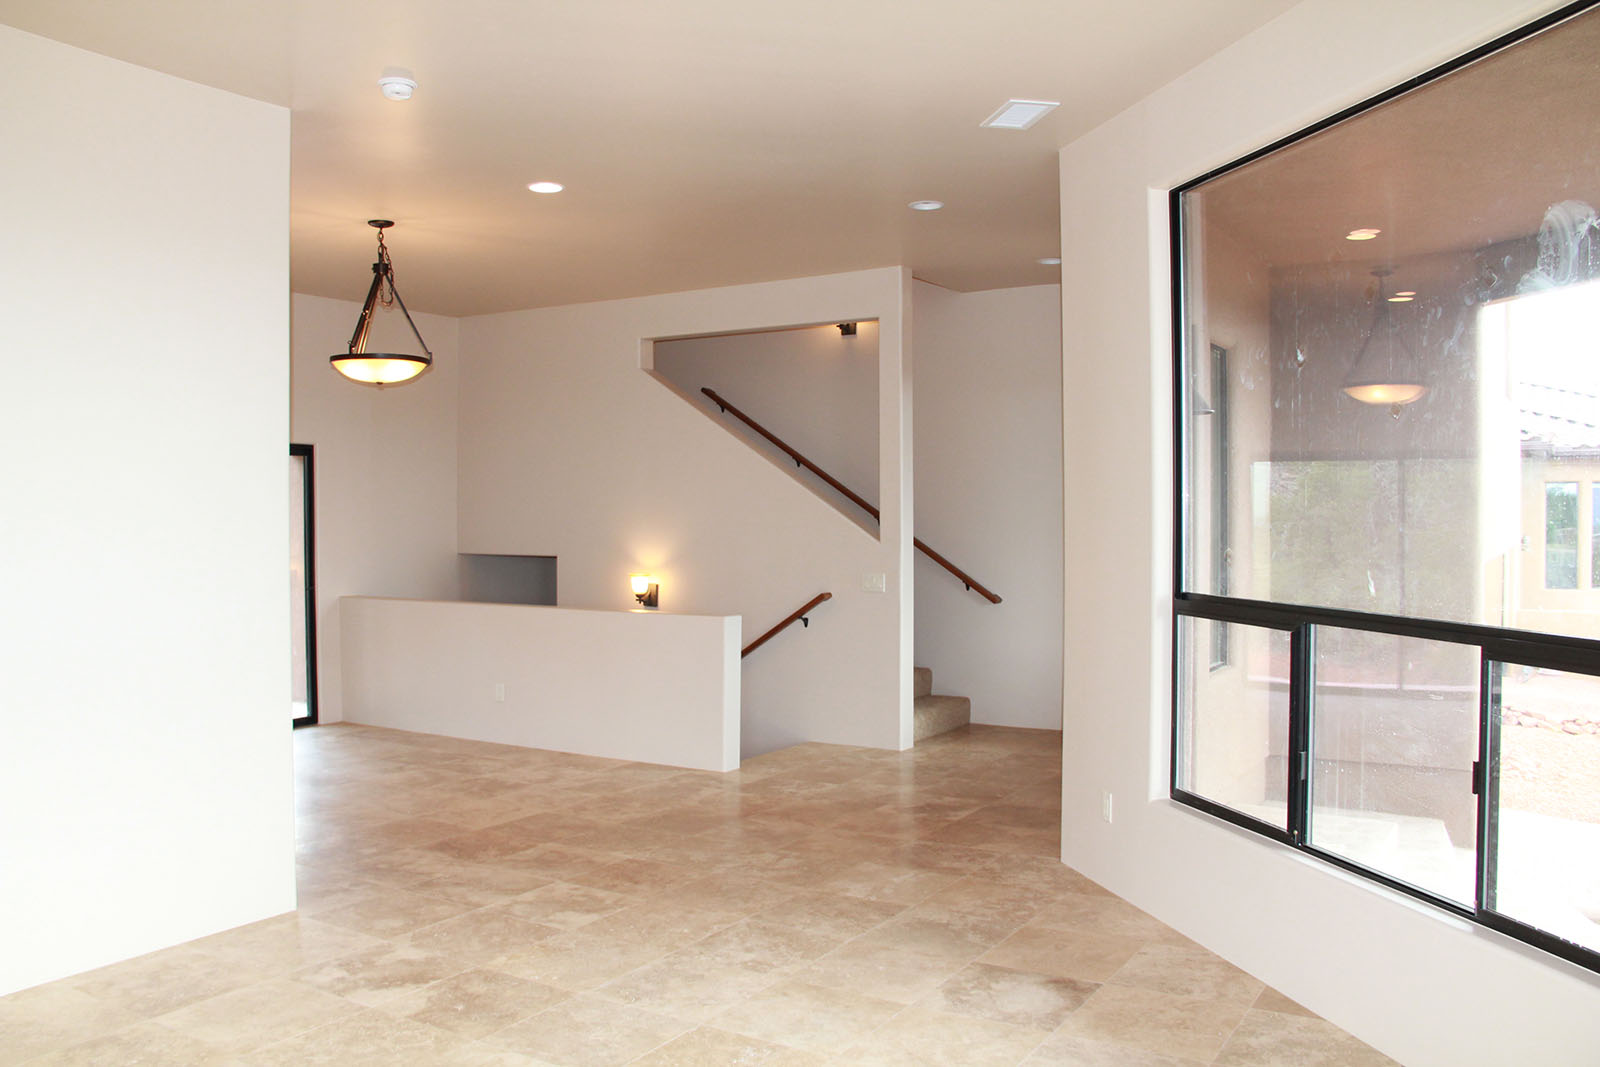 530-windsong-torel-custom-homes-sedona-arizona-0151-jpg